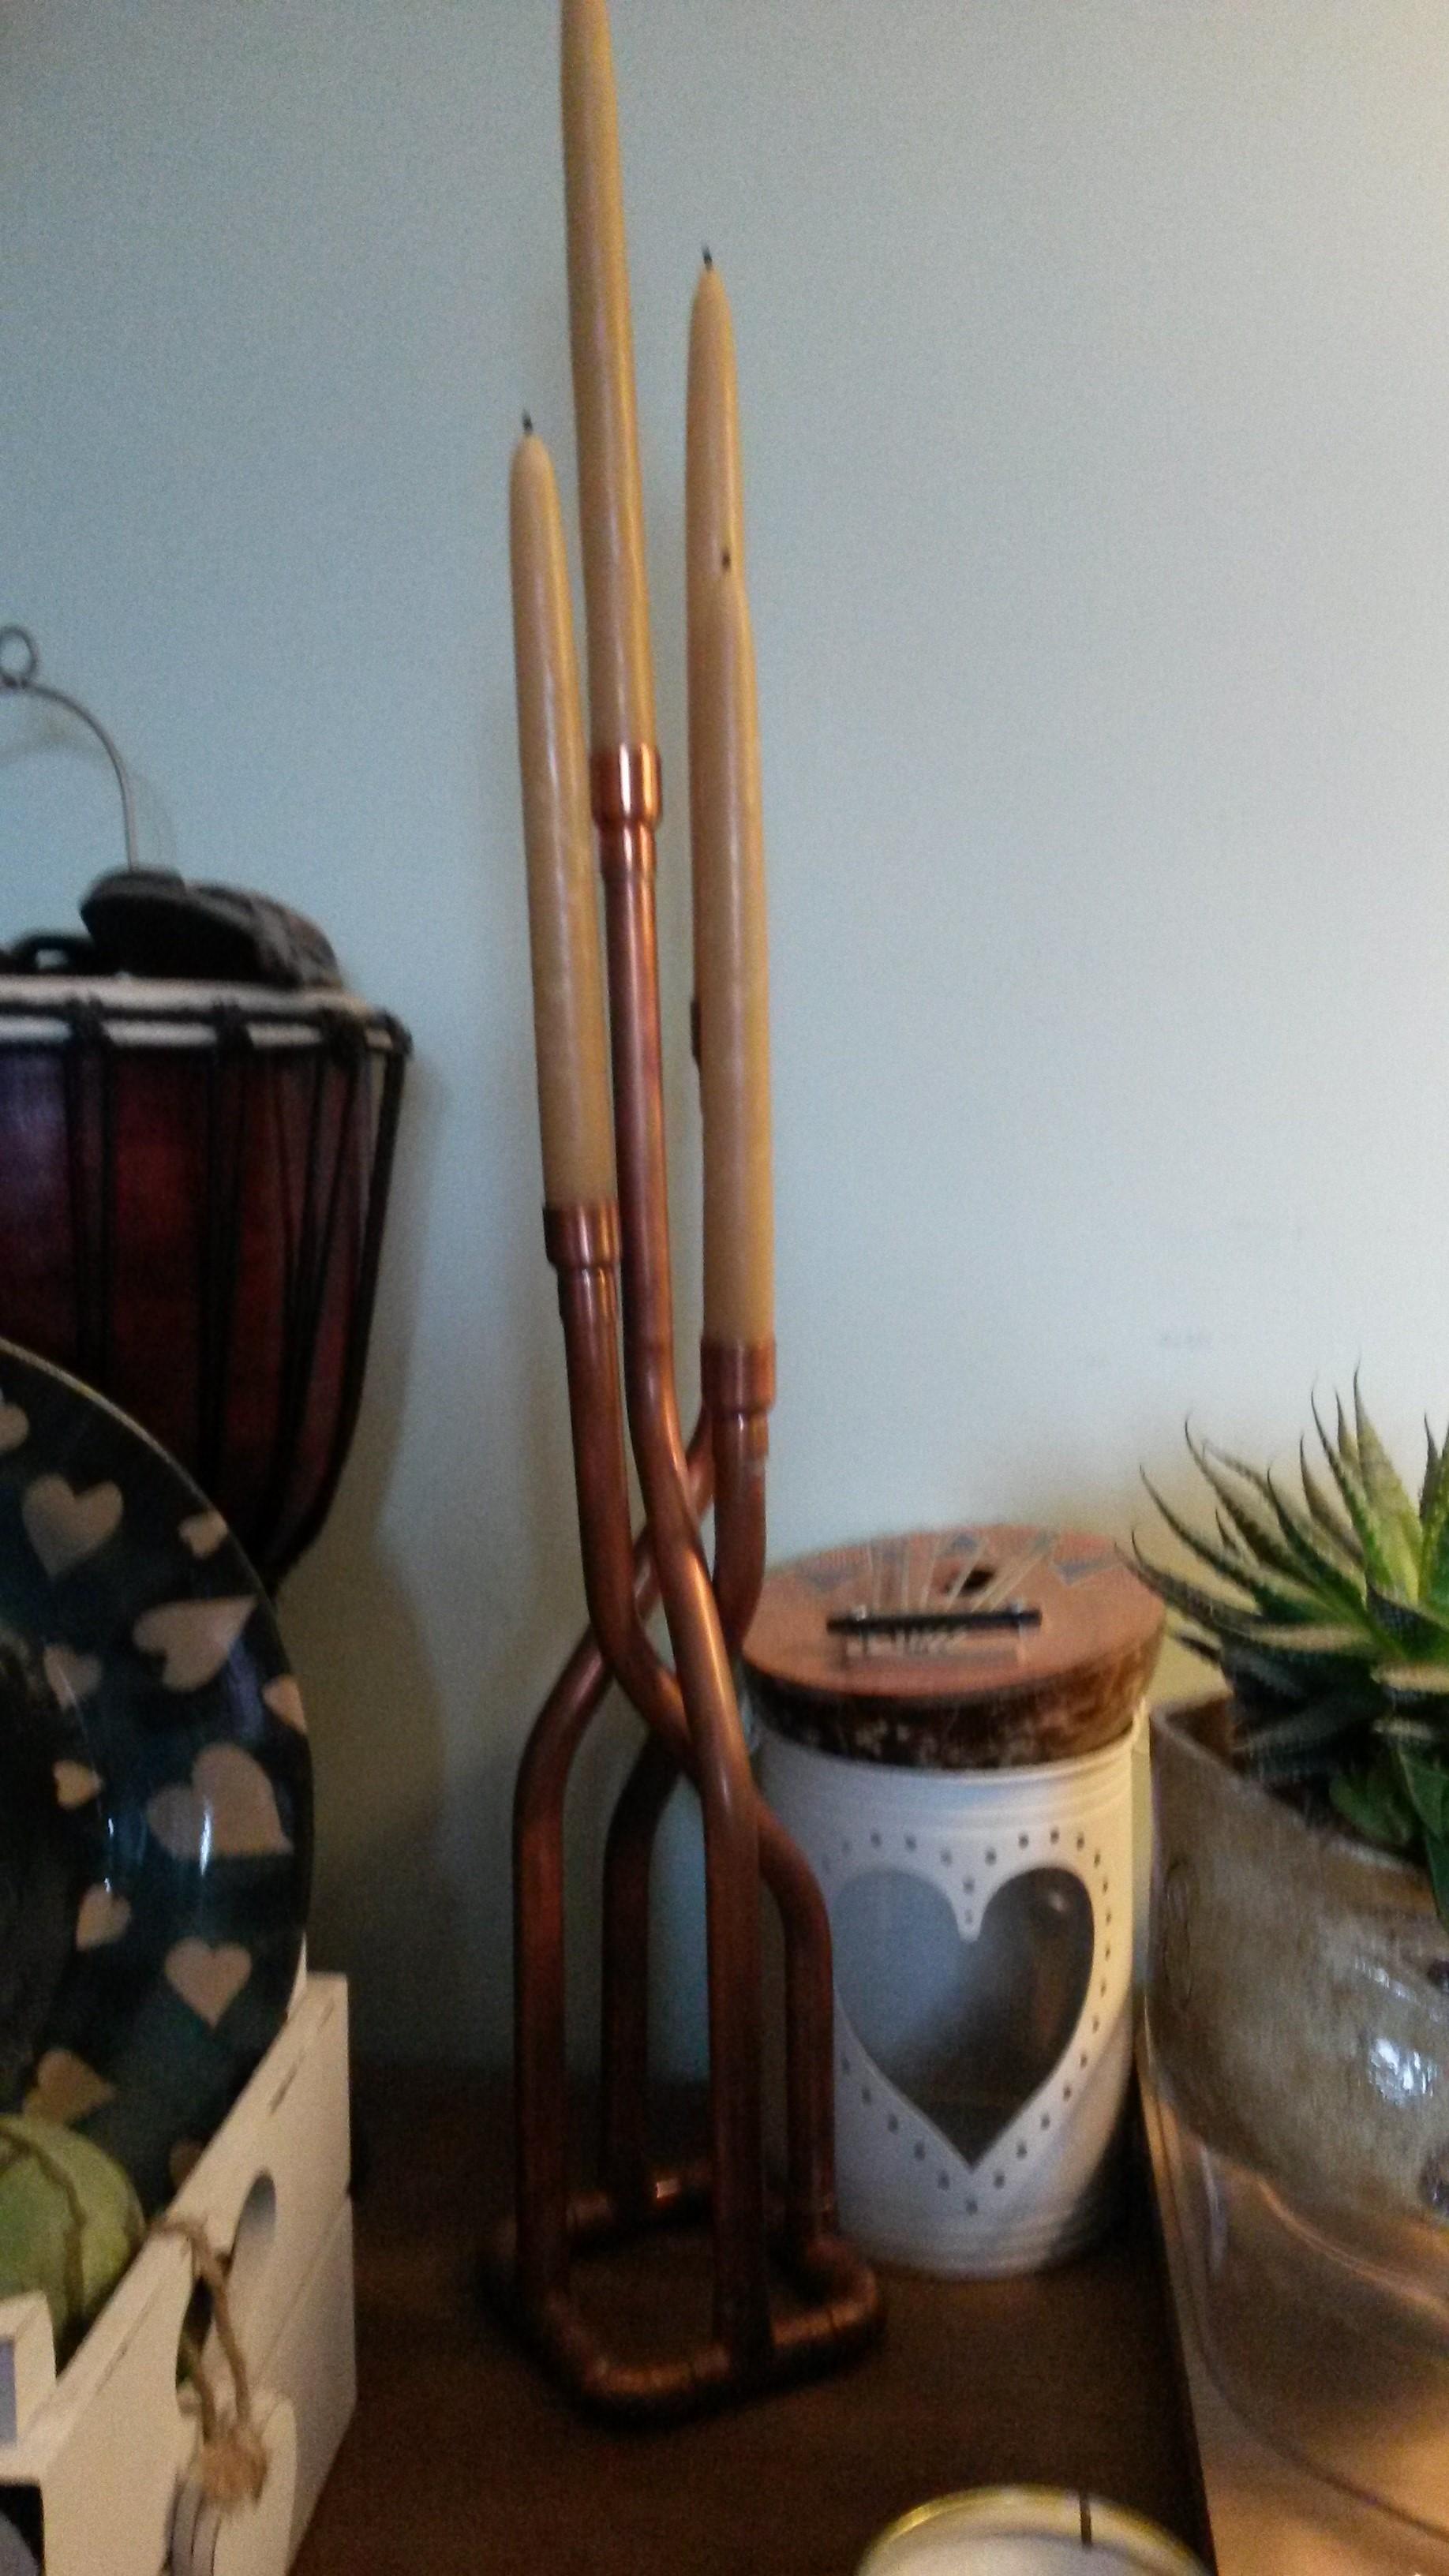 Custom Copper Candlestick Holder